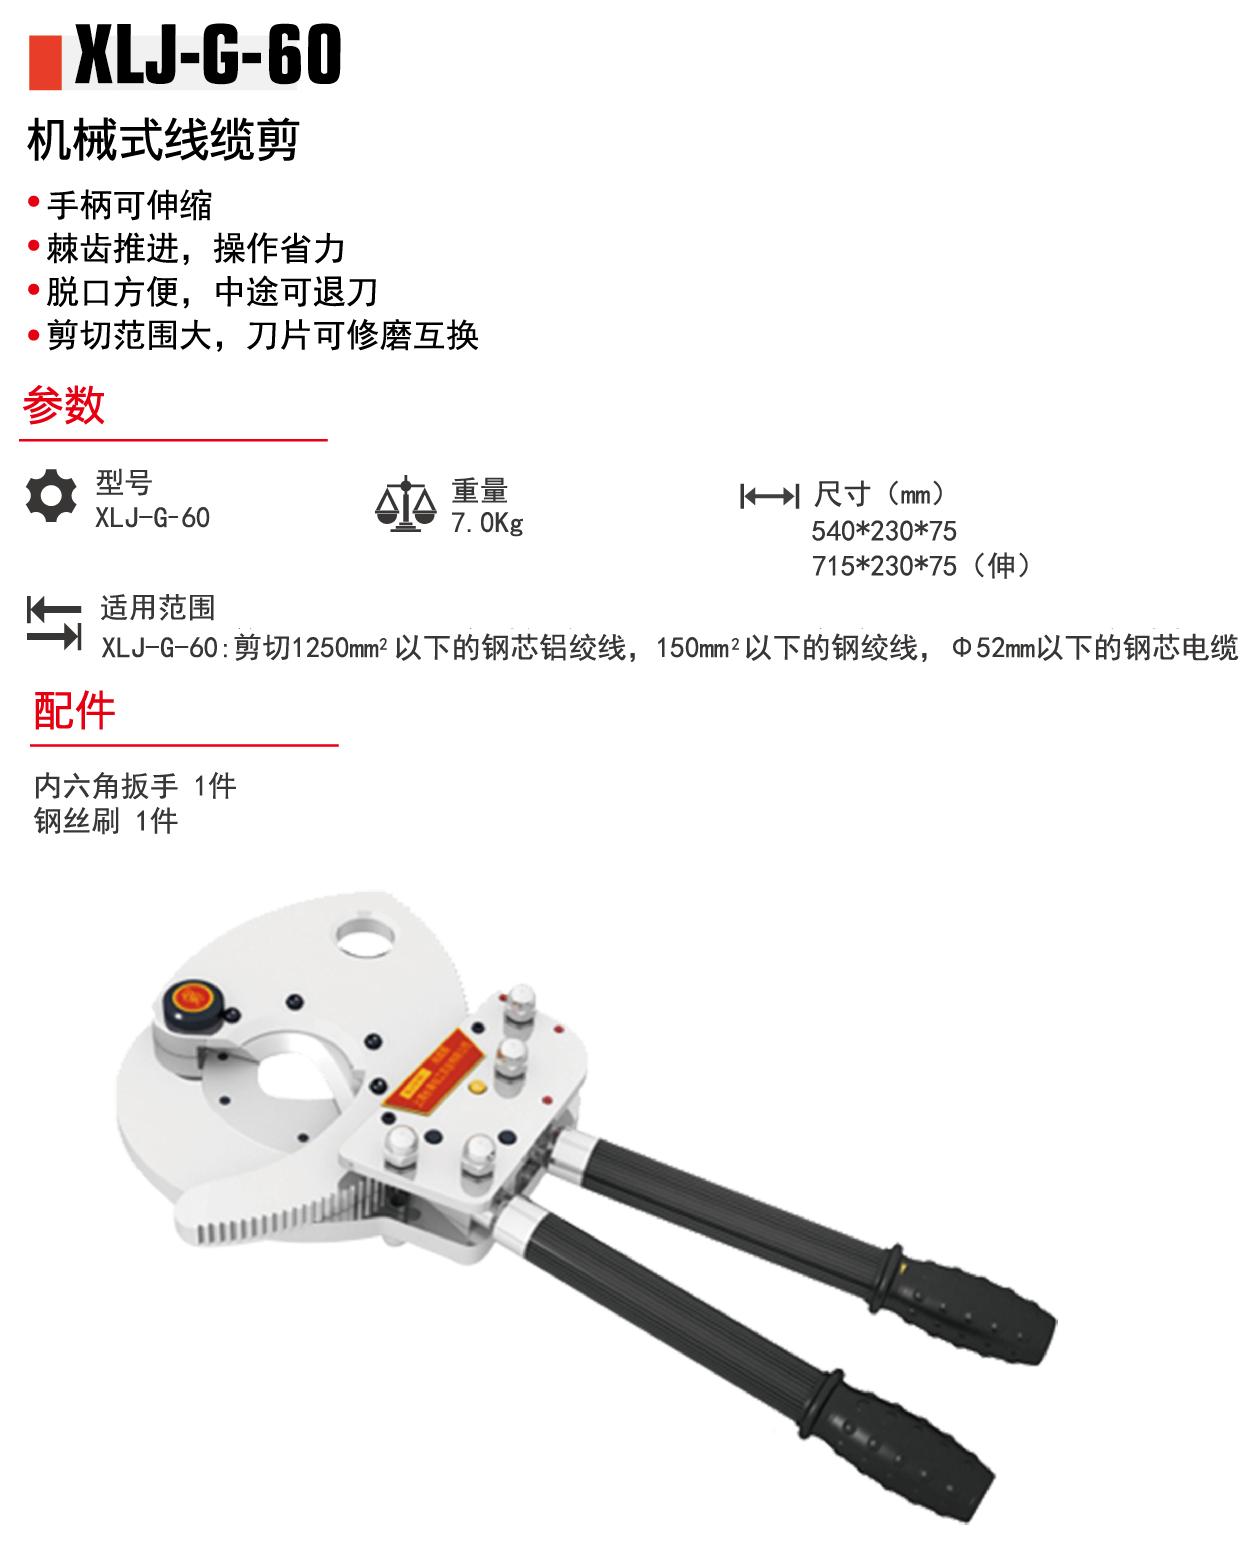 XLJ-G-60详情.png